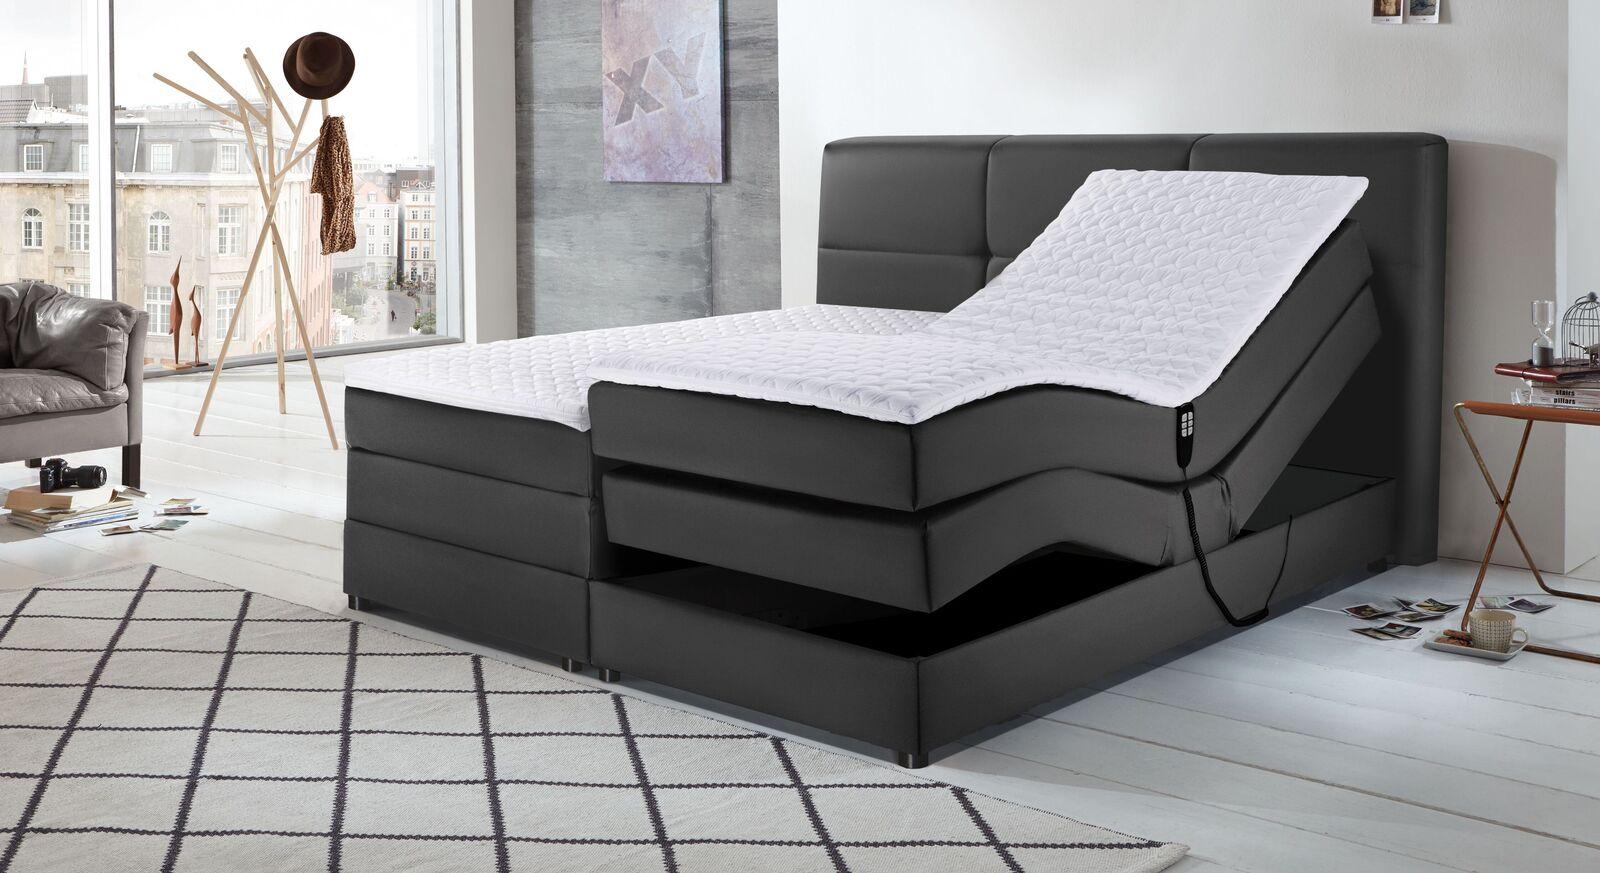 Elektro-Boxspringbett Veroli mit komfortablen Positionen